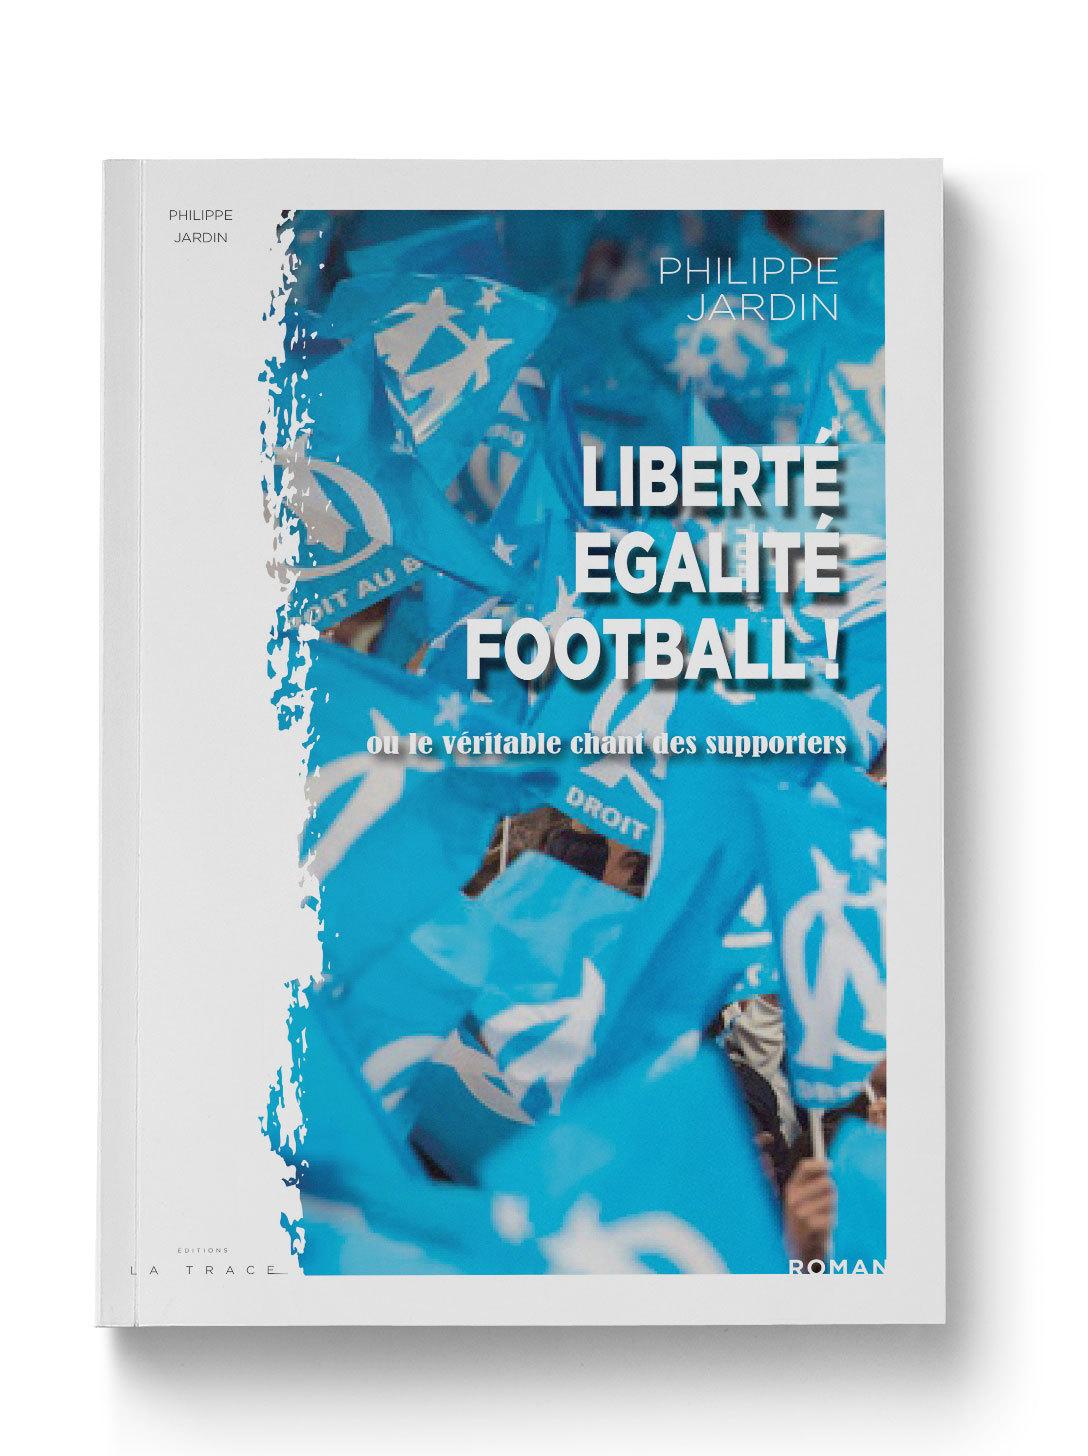 LIBERTE - EGALITE - FOOTBALL !